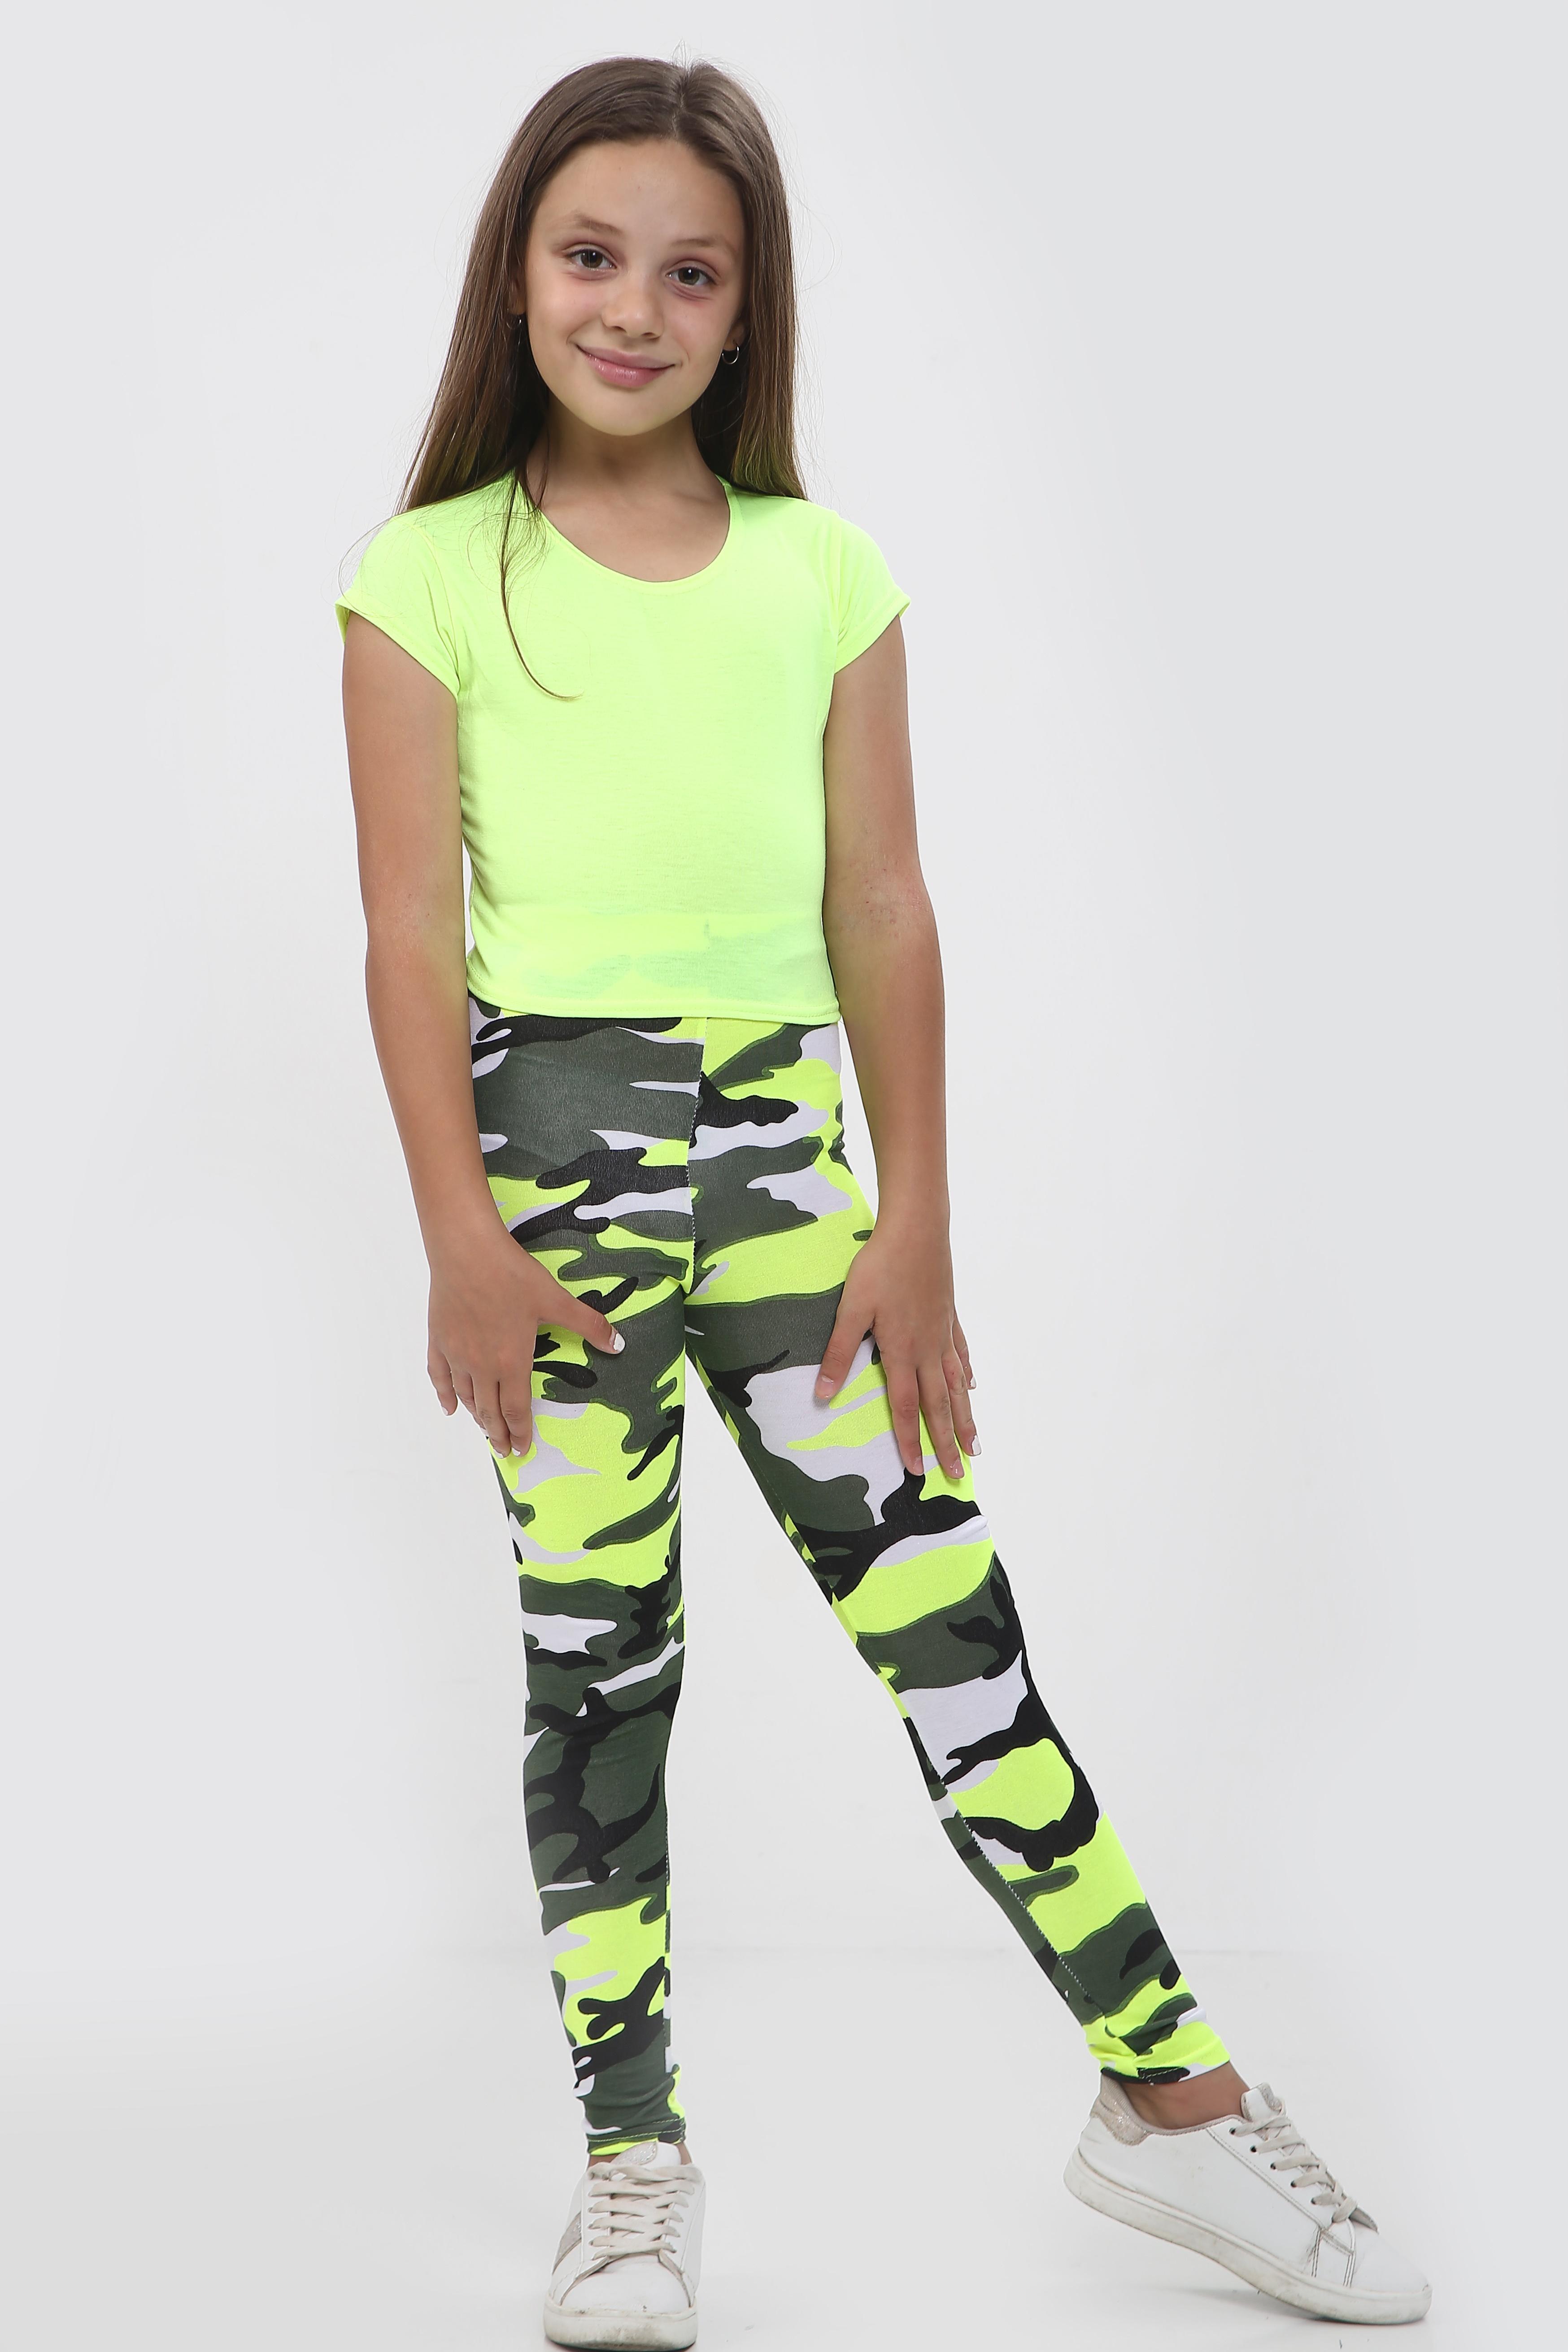 Girls Yellow Crop Top & Camouflage Trouser Set